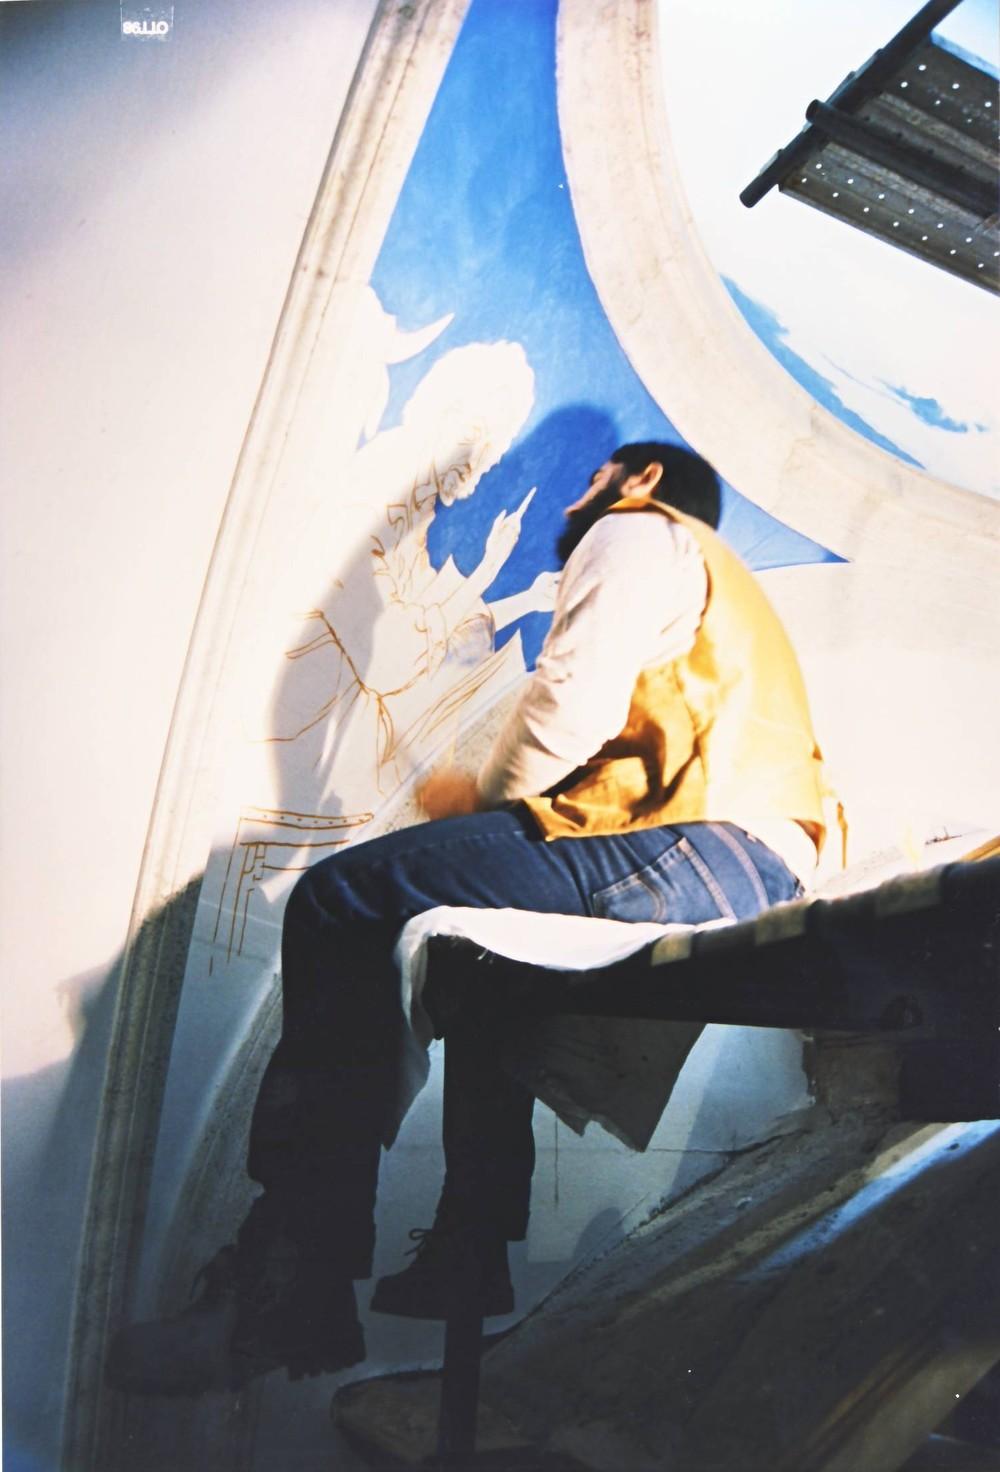 291 rodolfo mentre dipinge 1.JPG